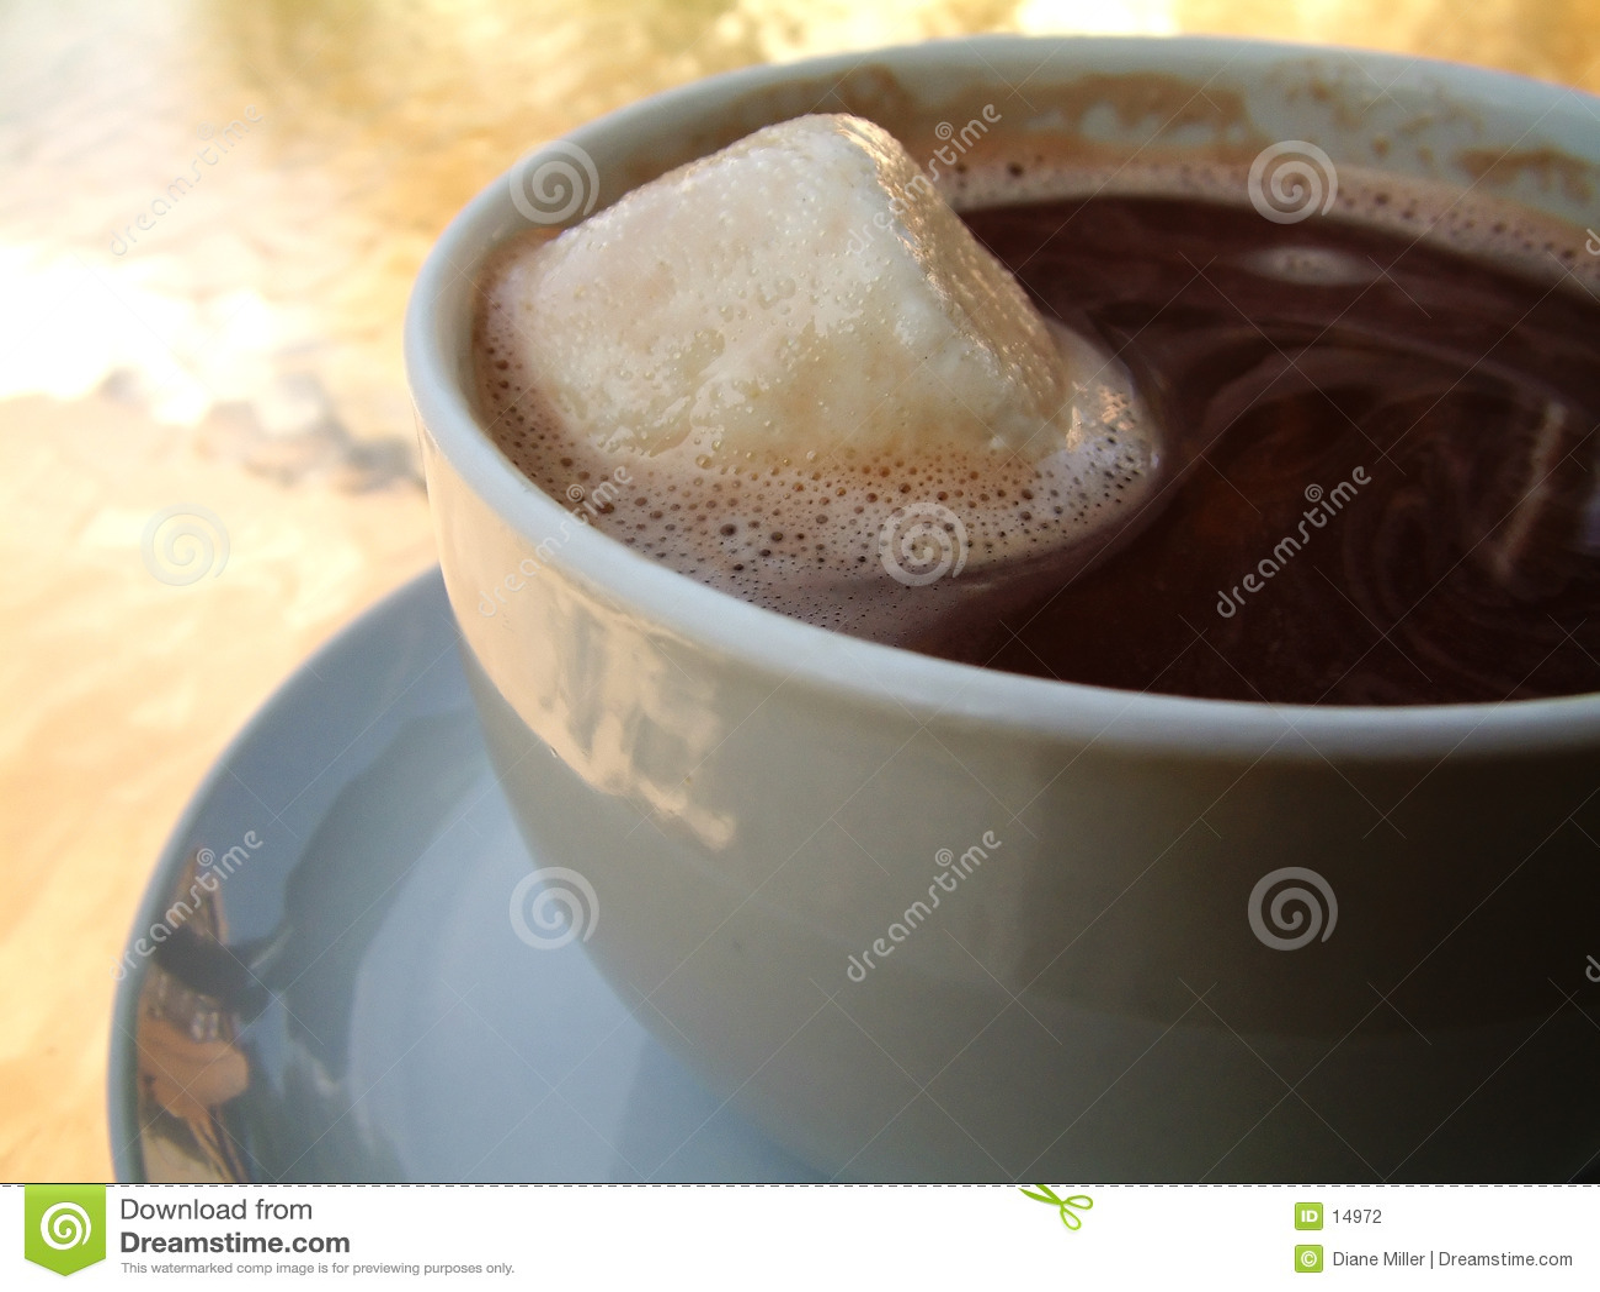 Hot chocolate, extra marshmallow